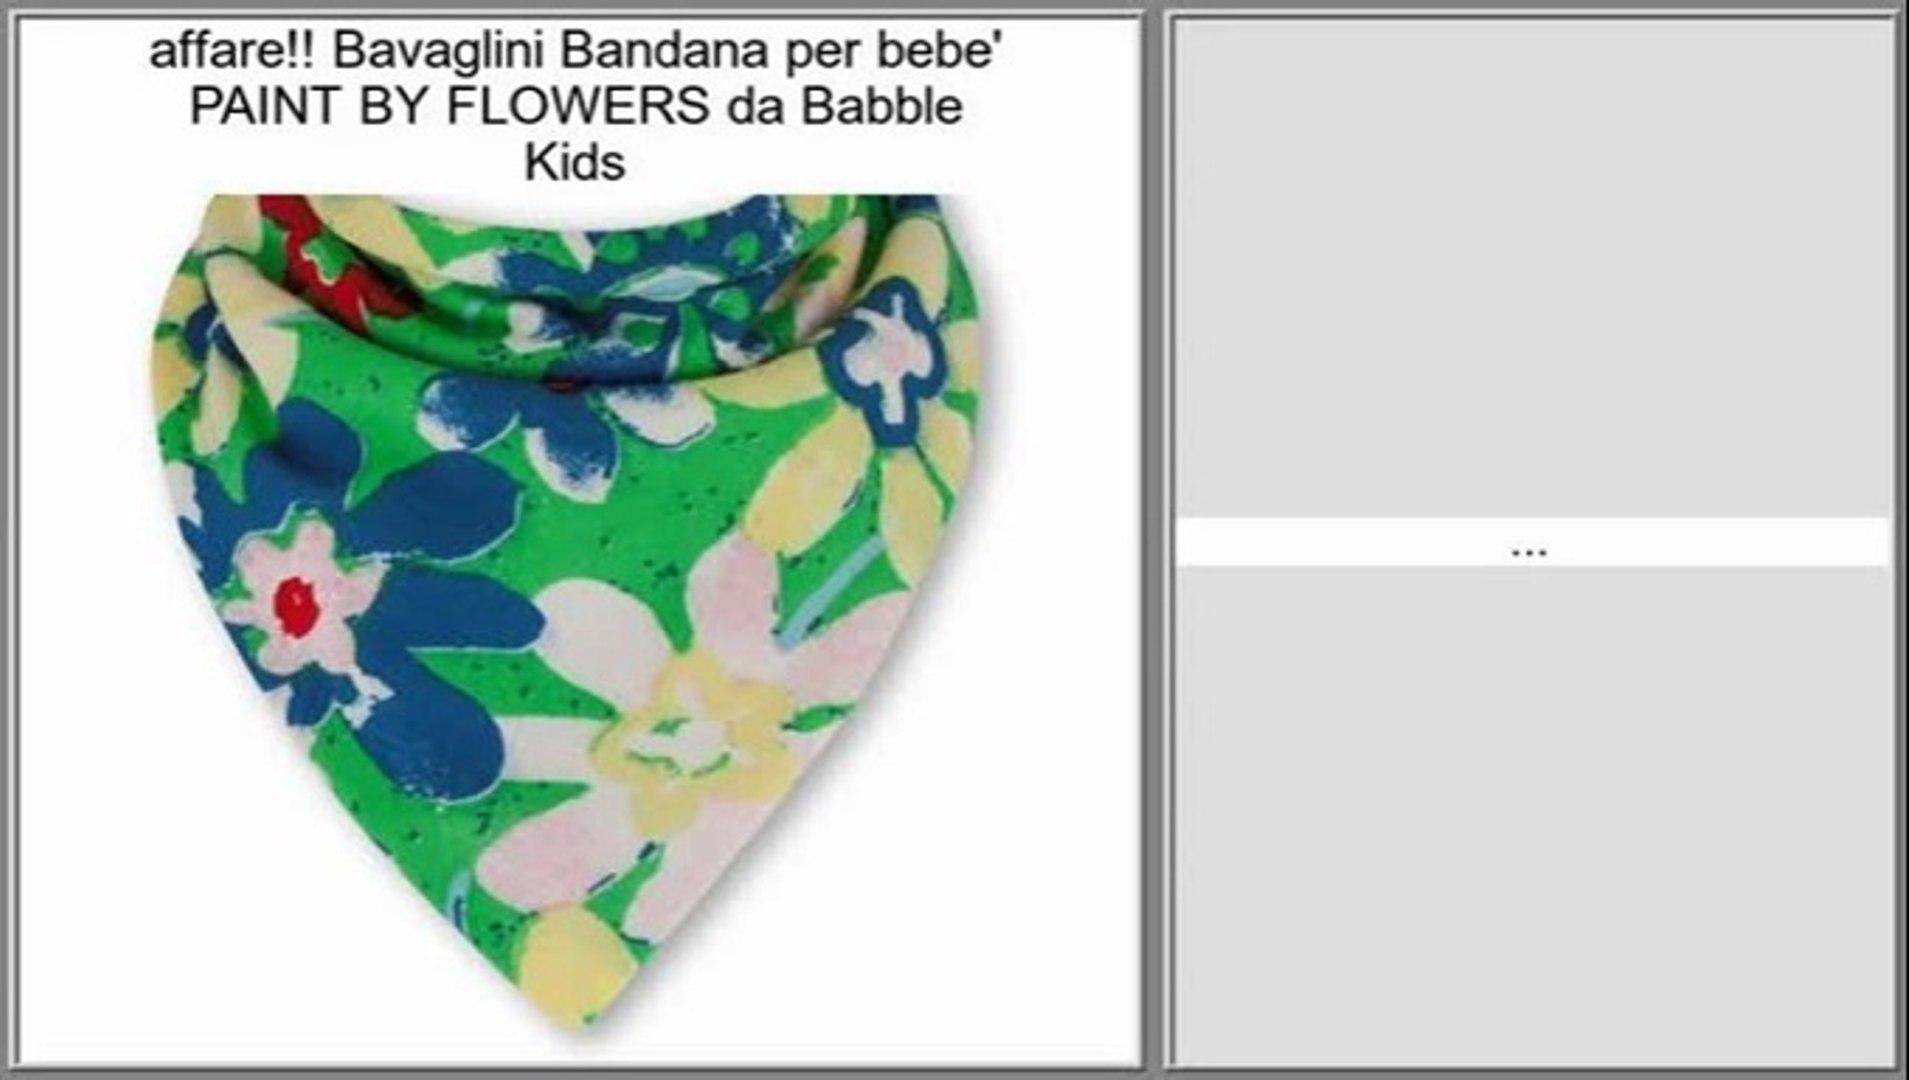 Bavaglini Bandana per bebe' PAINT BY FLOWERS da Babble Kids Recensioni